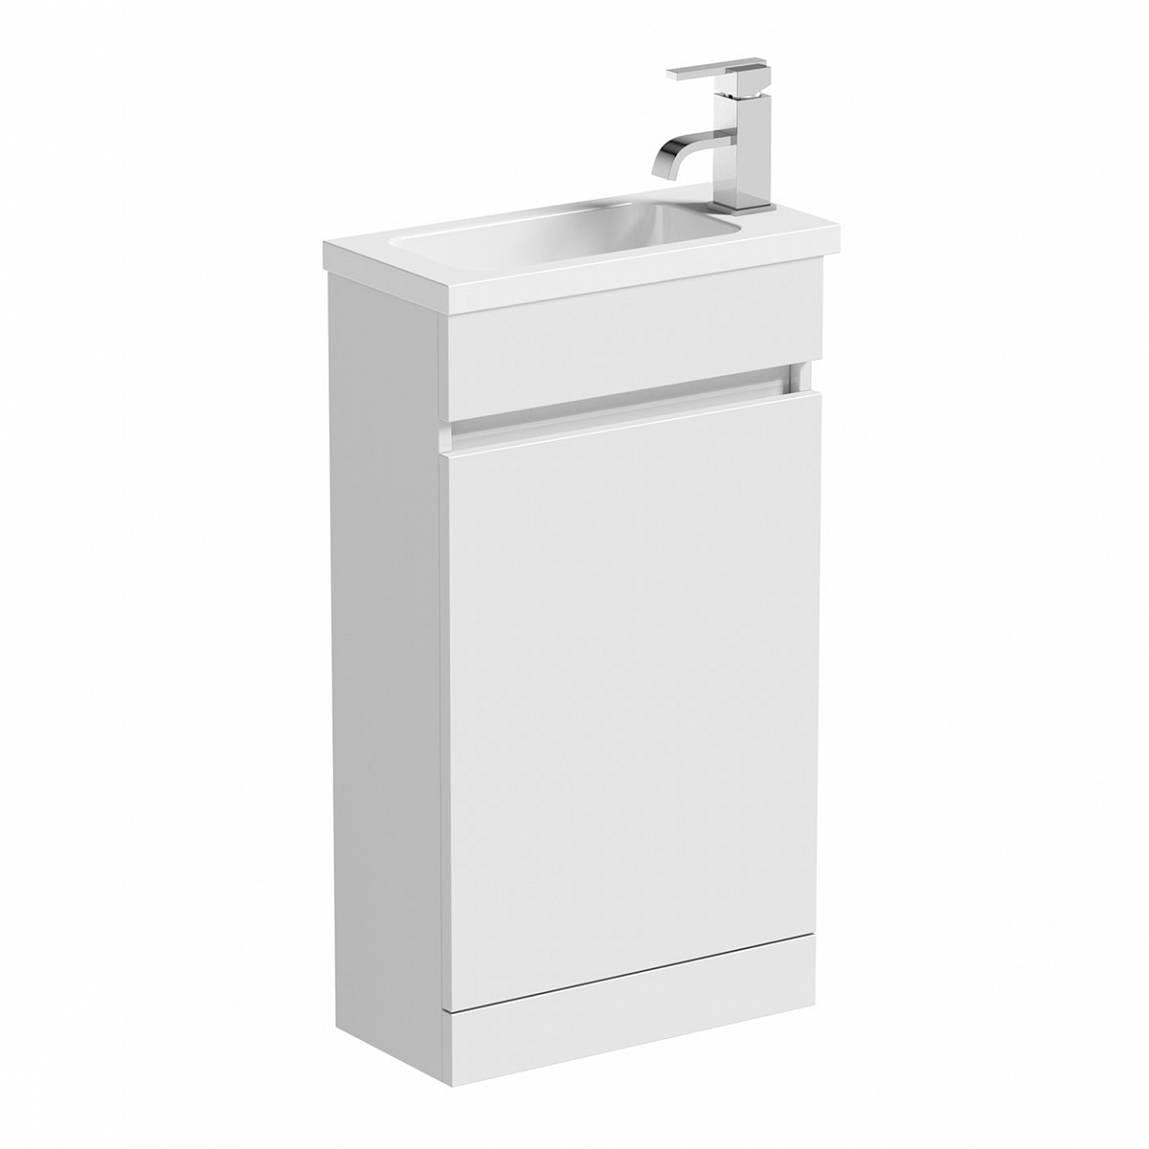 Plan White Compact Unit & Basin